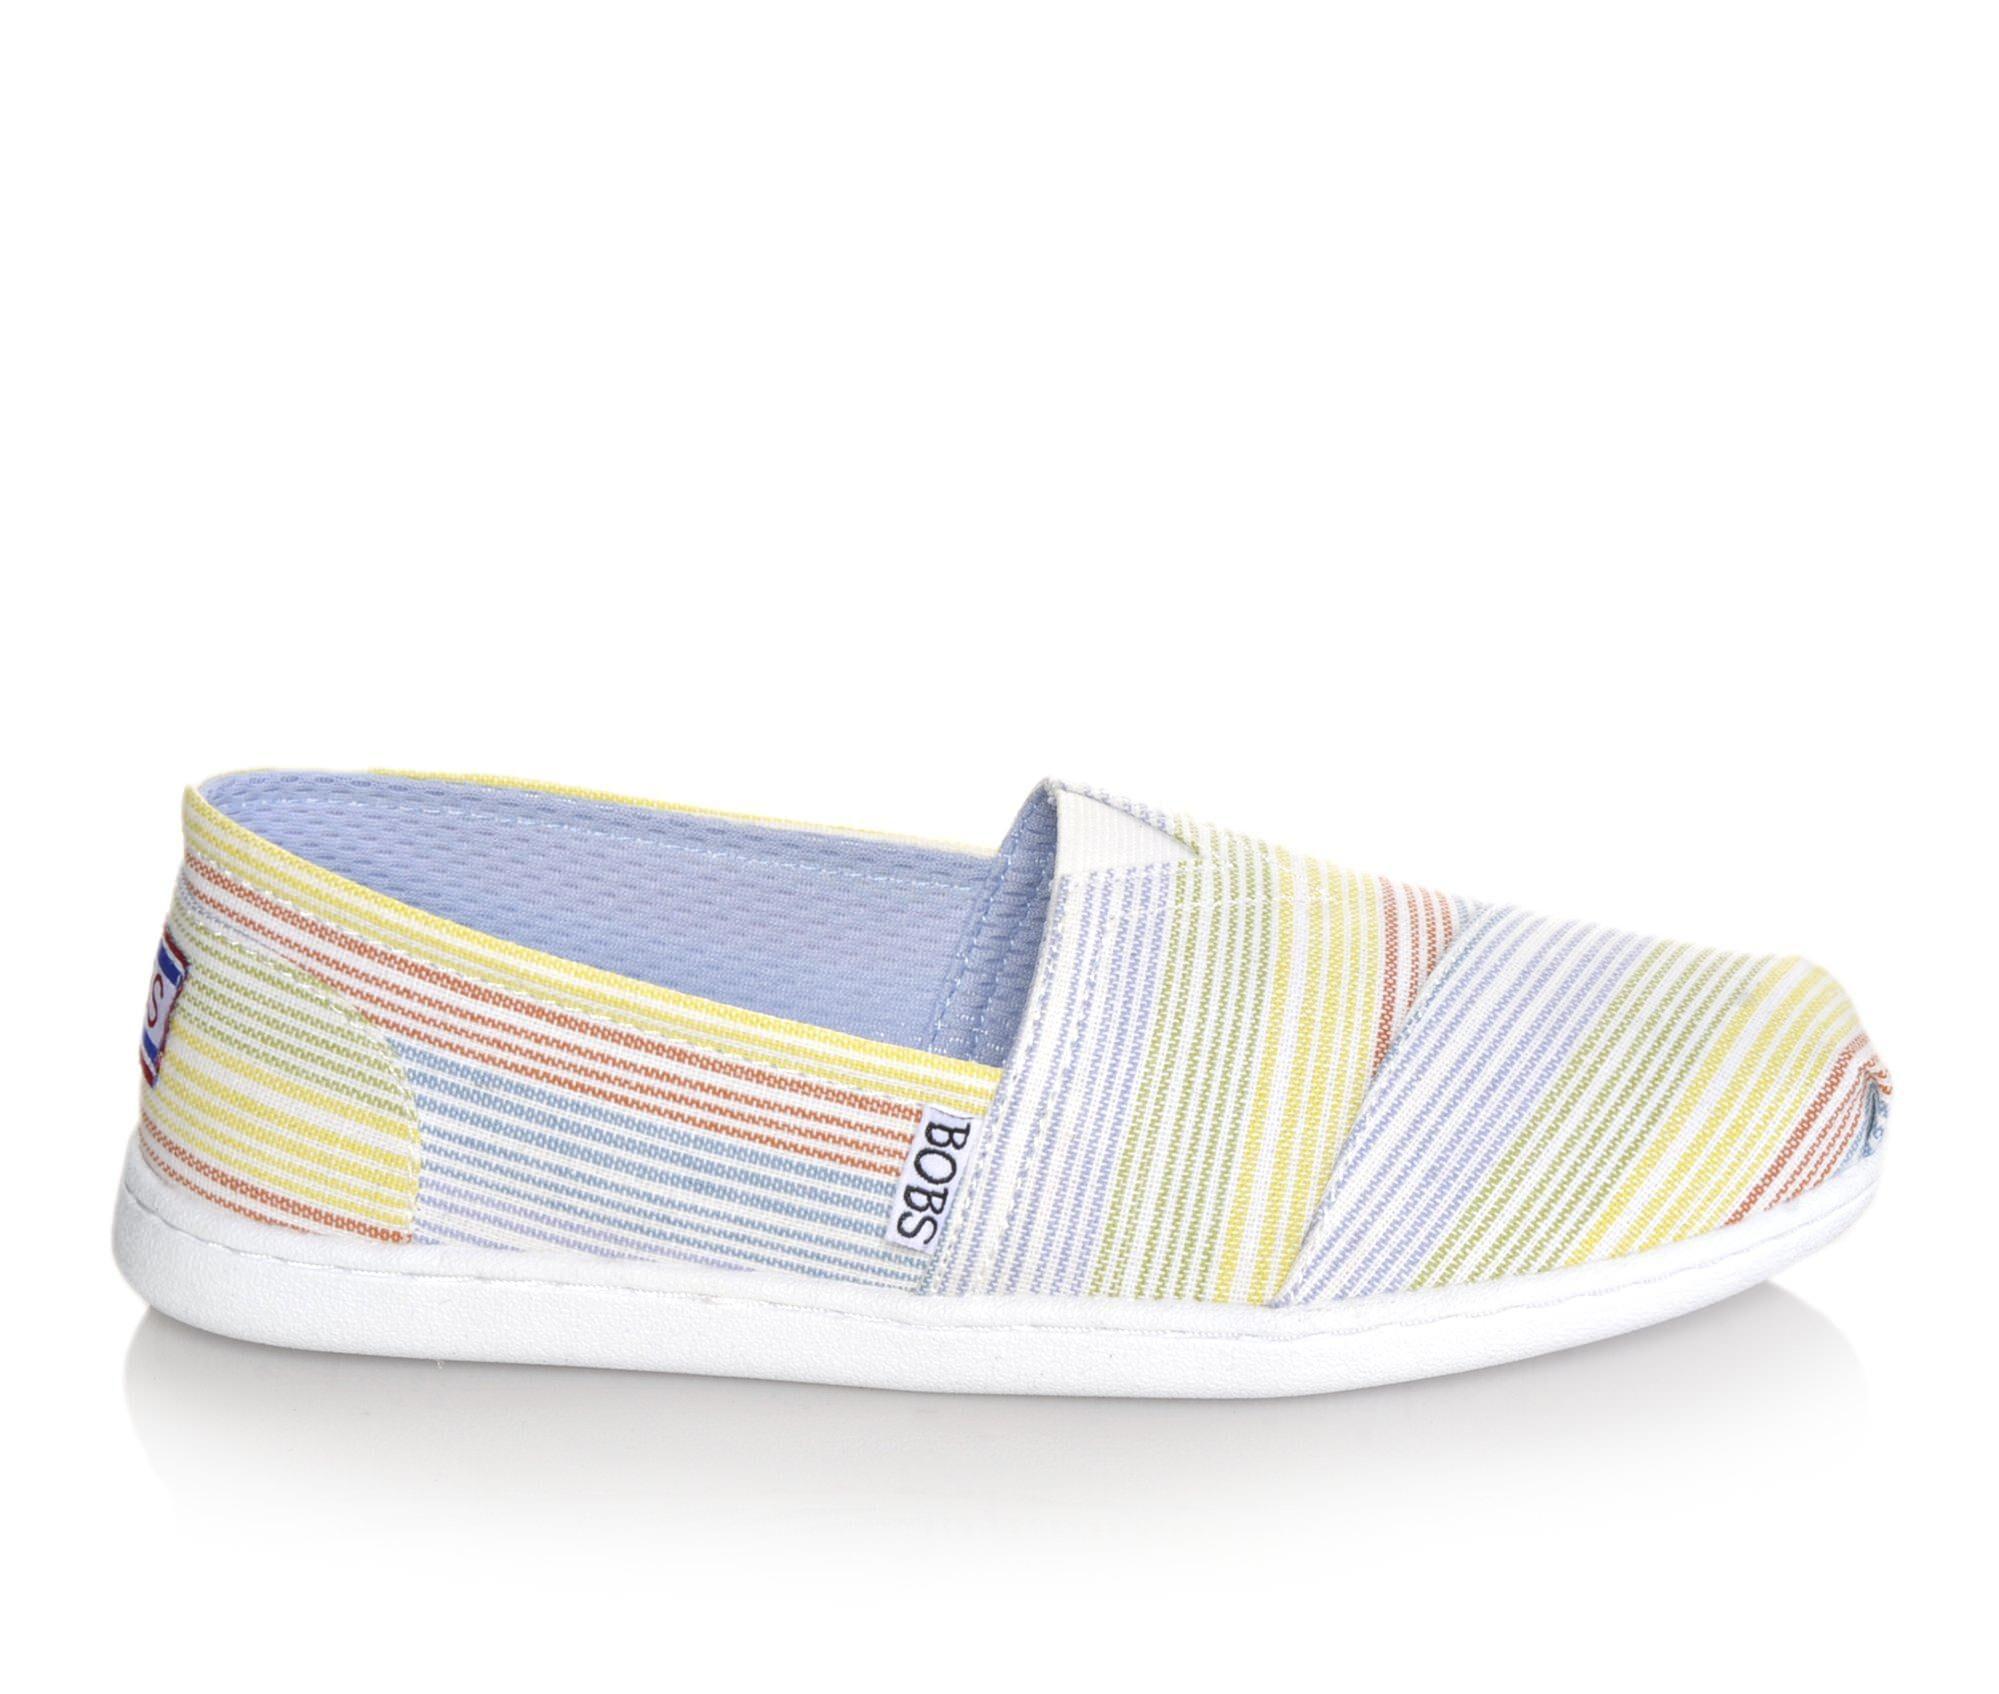 BOBS Shoes BOBS Open Heart 34148 Womens Flats Multi